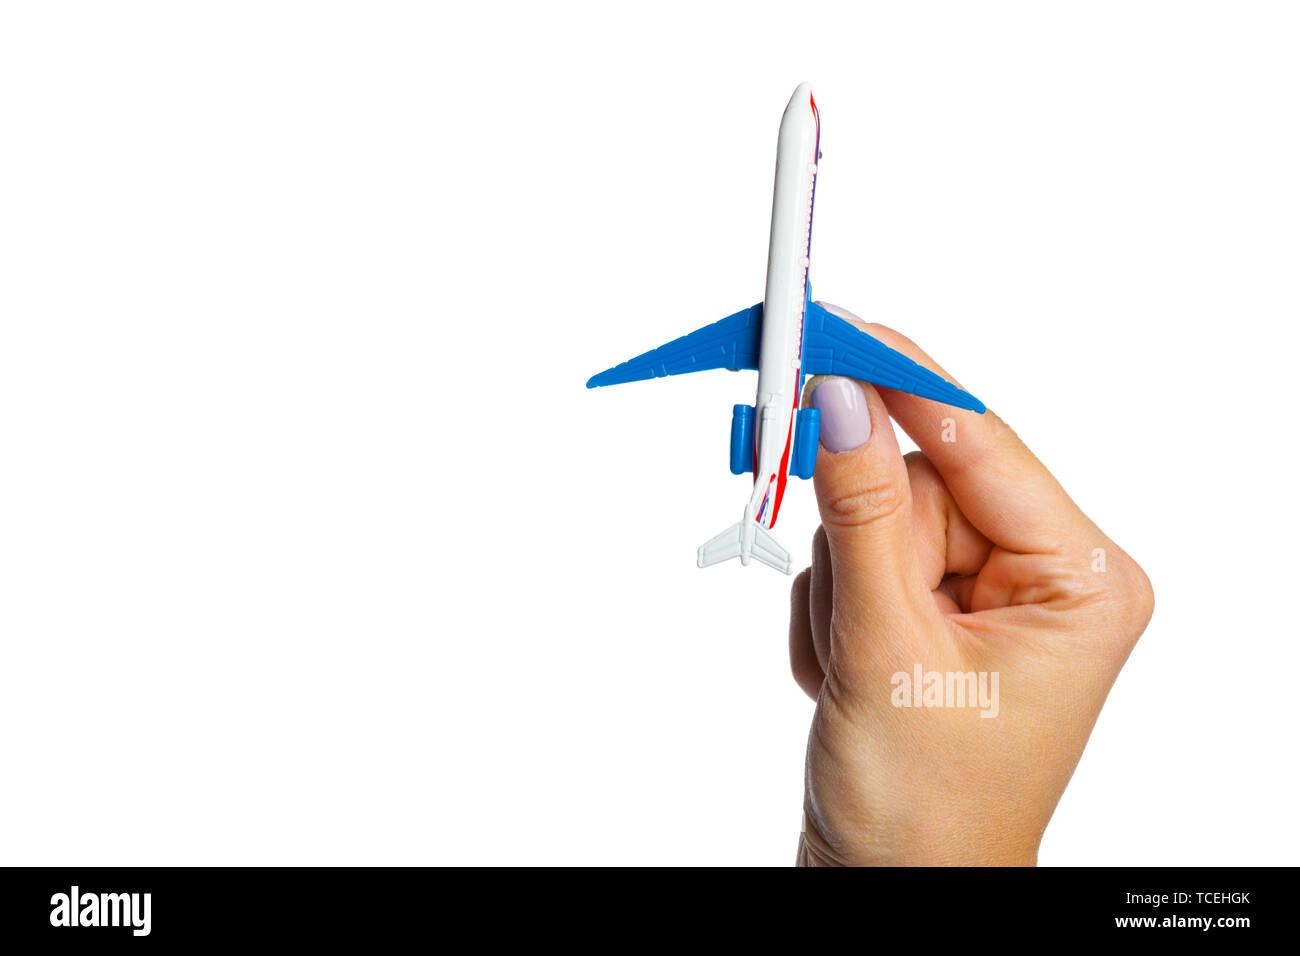 hand holding airplane toy model isolated on white background - Stock Image